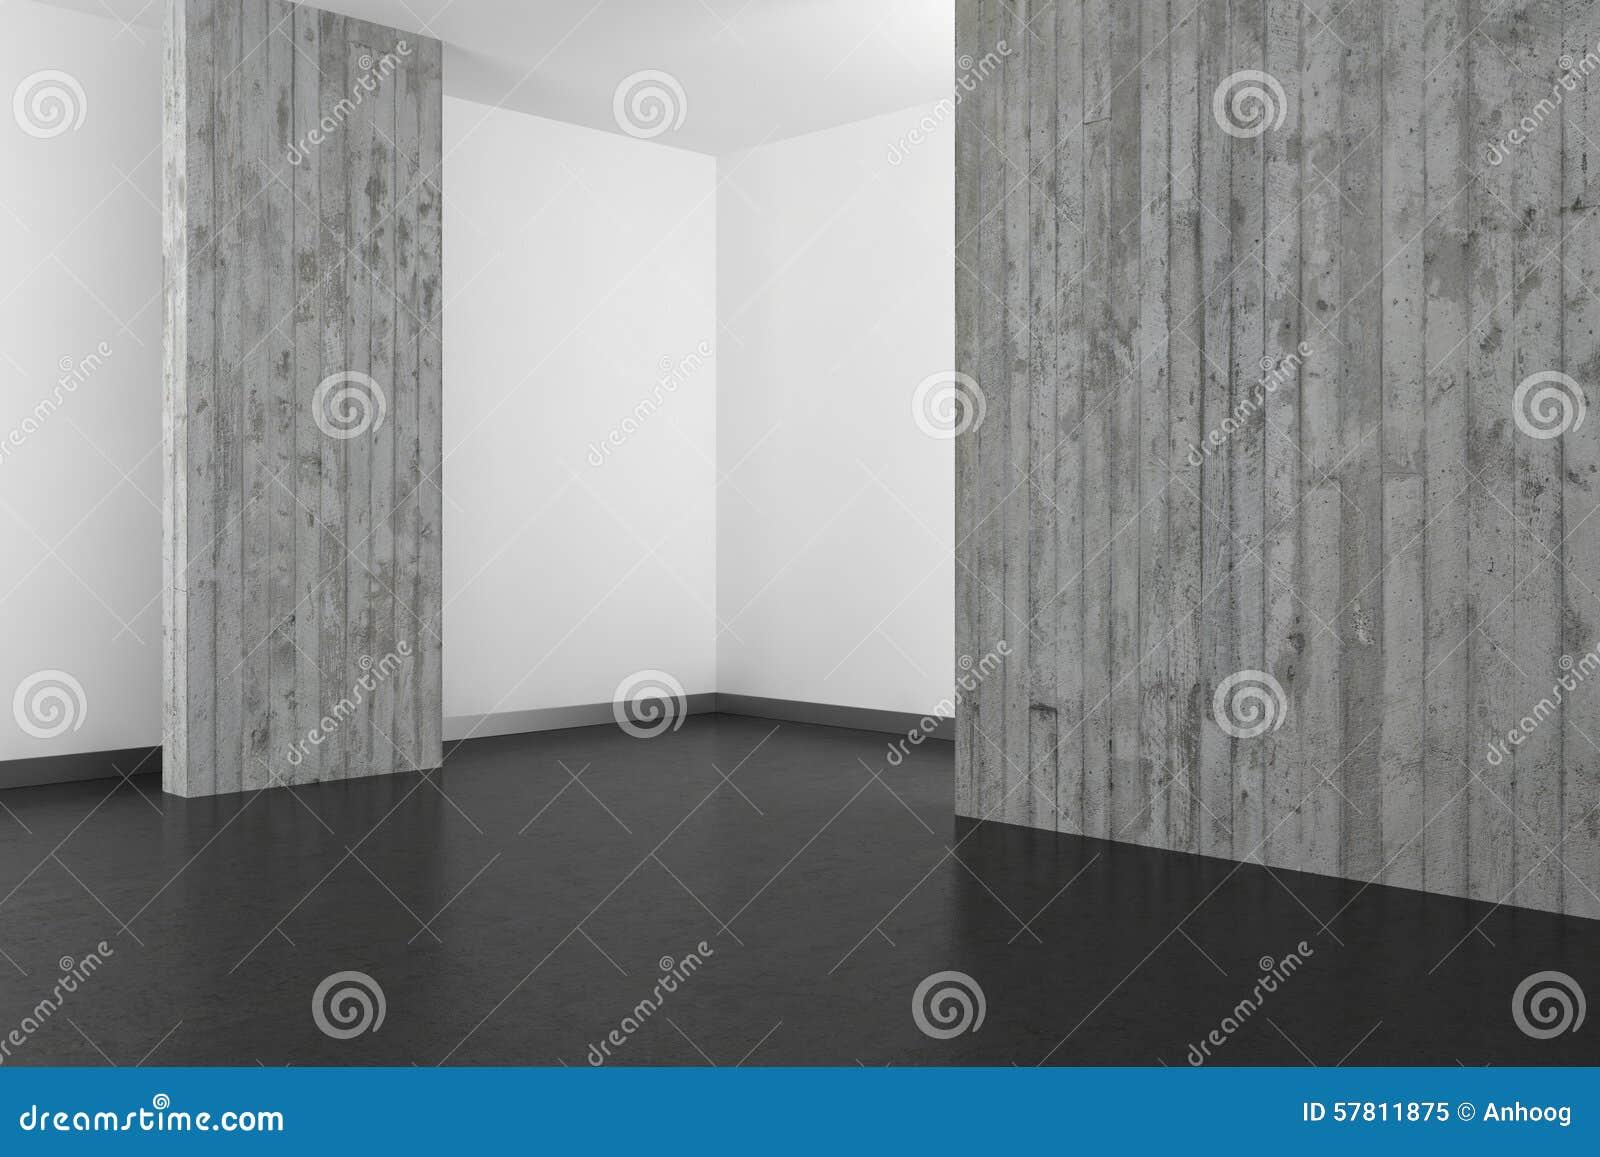 Resin bathroom floor - Bathroom Concrete Dark Empty Floor Modern Resin